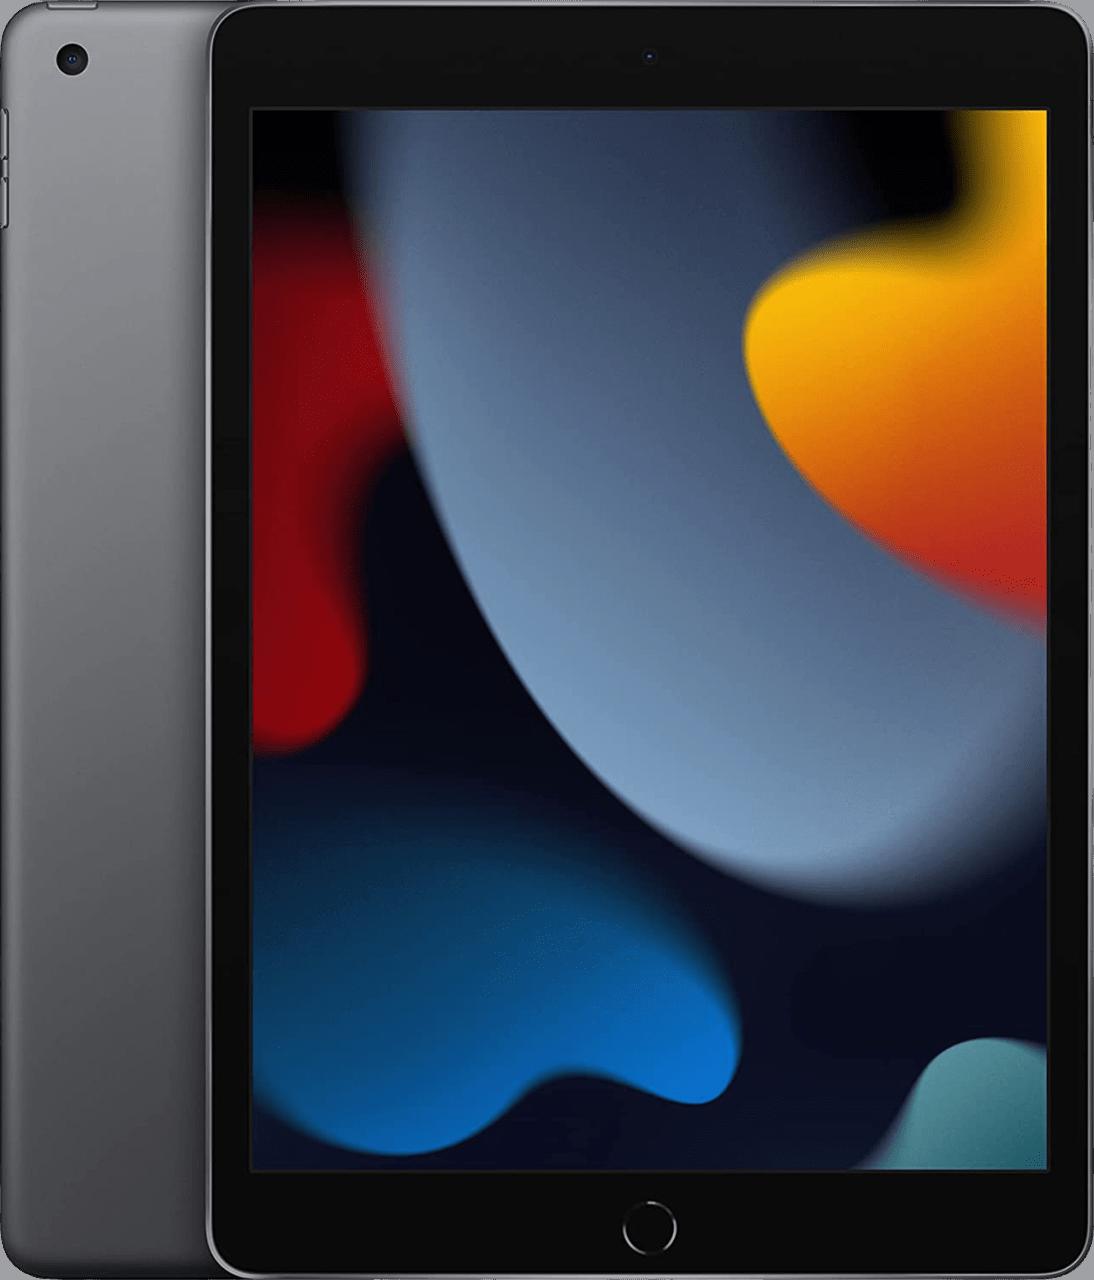 Space Grey Apple iPad (2021) - LTE - iOS 15 - 256GB.1